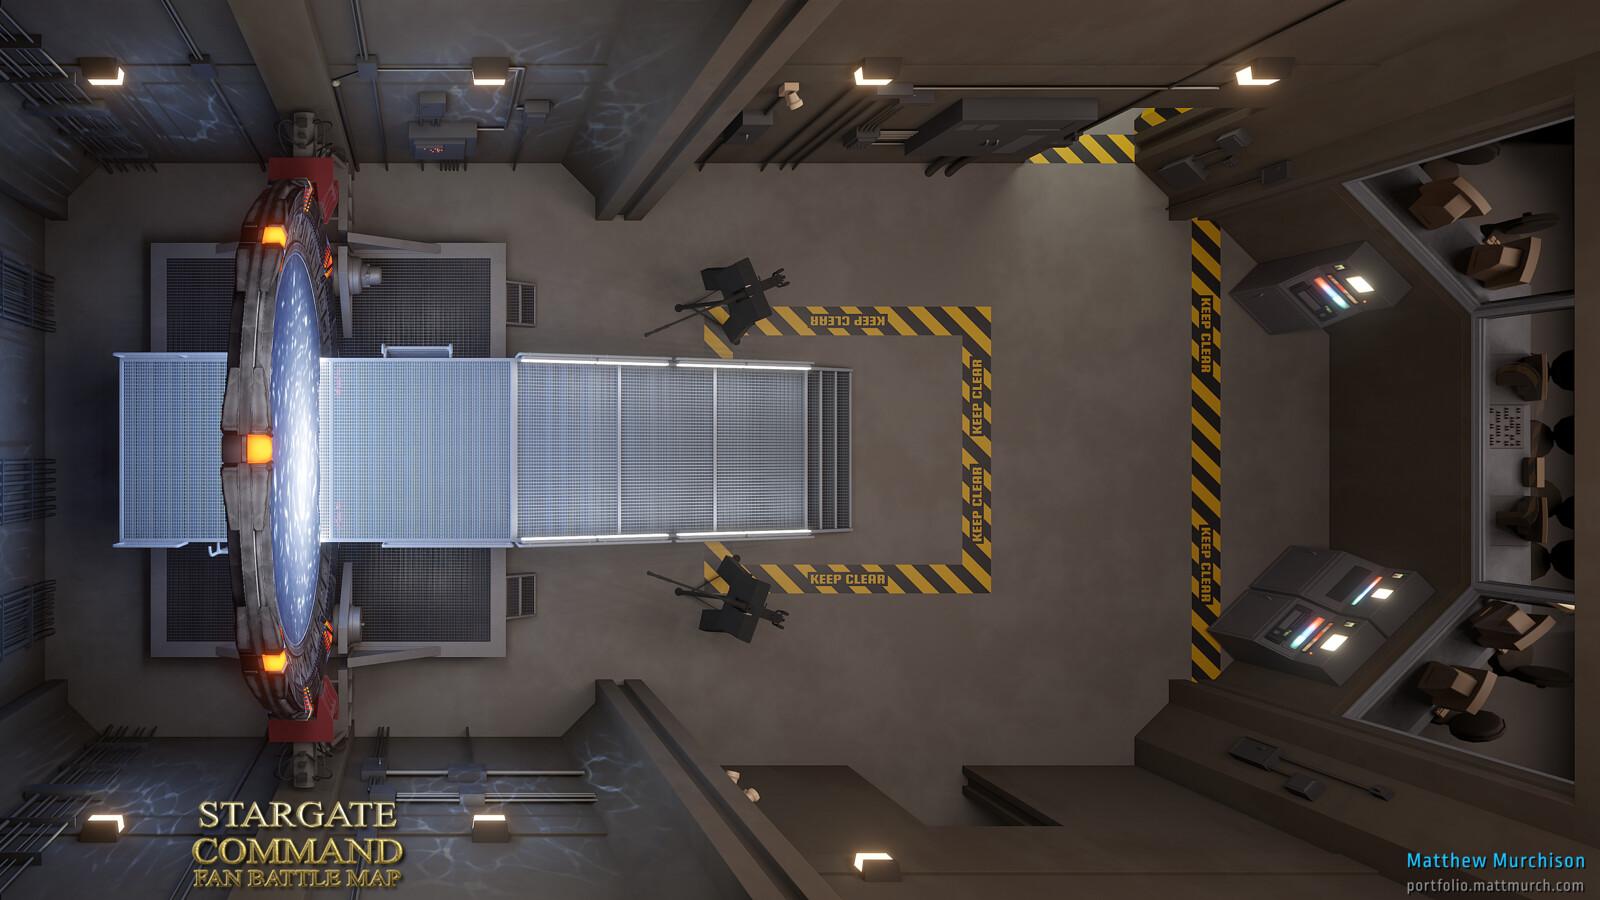 SGC Gateroom Battlemap